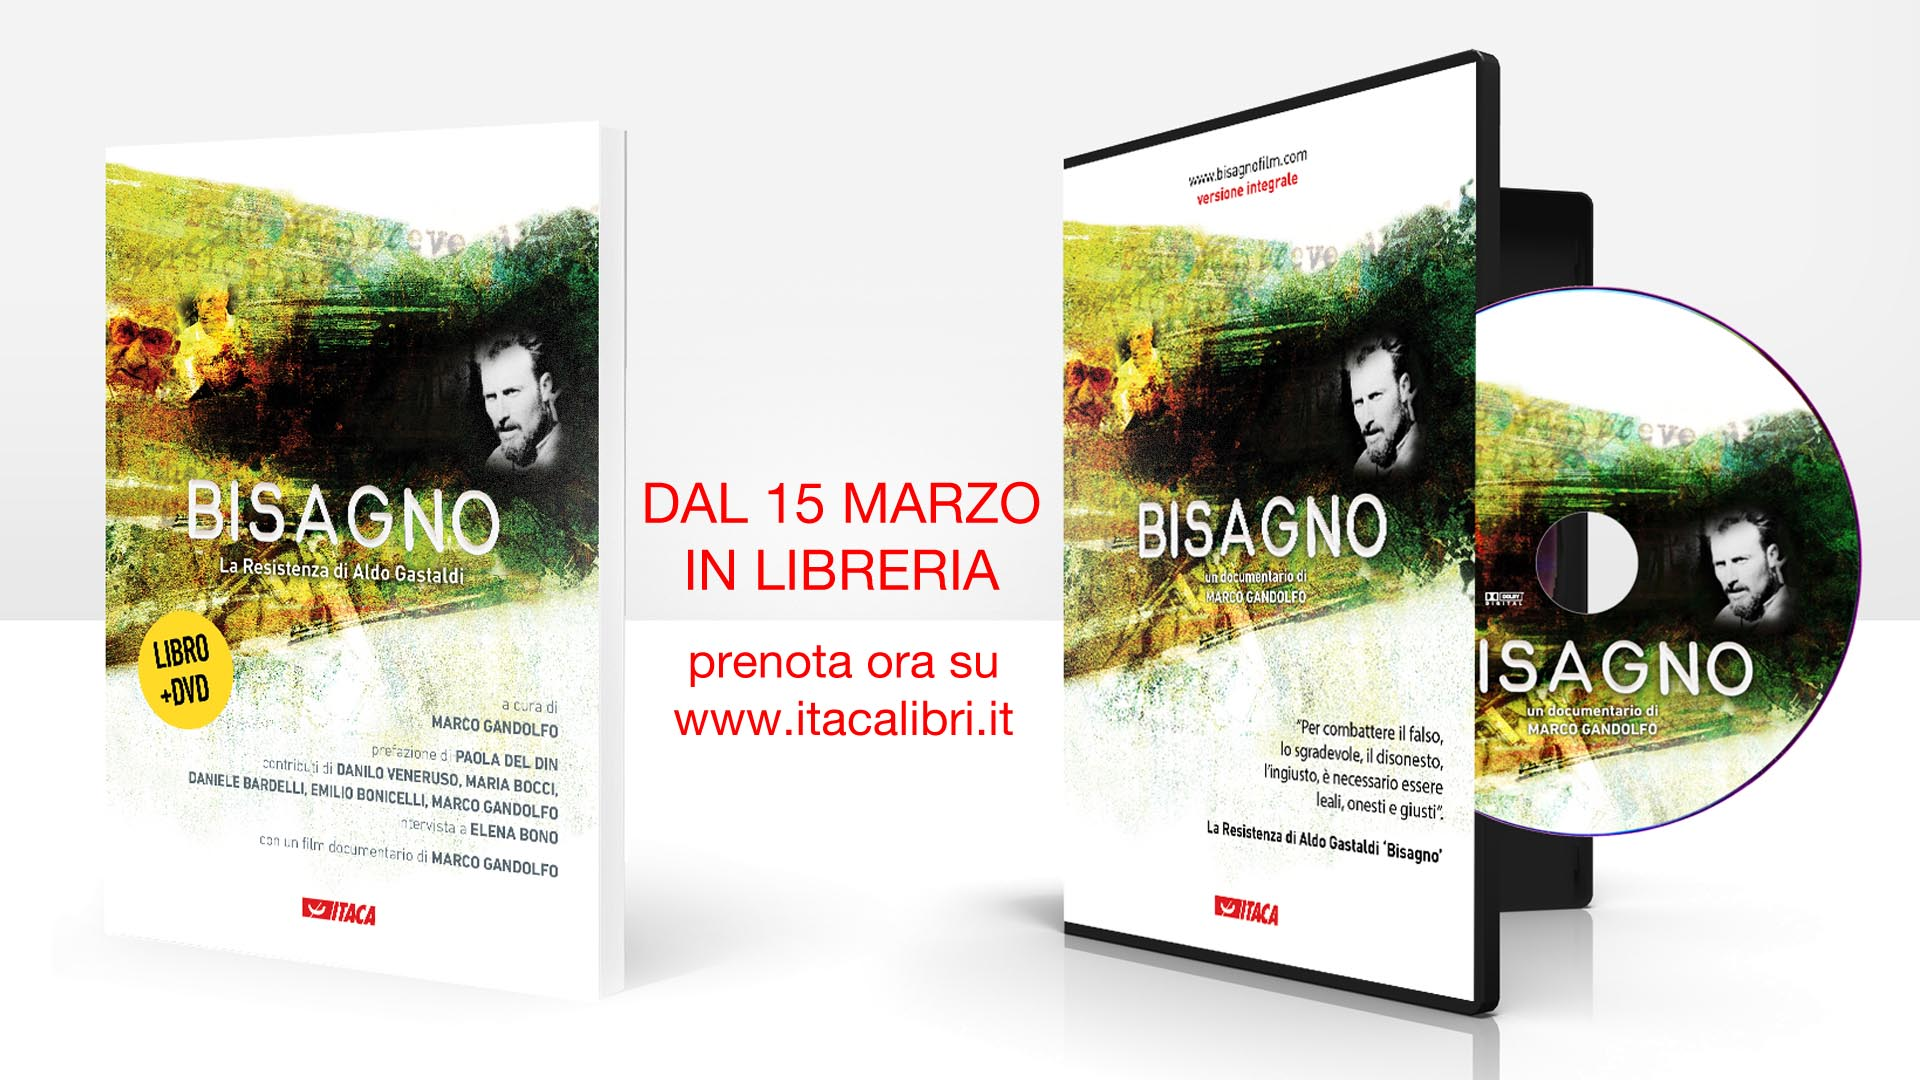 Bisagno. Con Dvd La resistenza di Aldo Gastaldi. Marco Gandolfo | Libro | Itacalibri